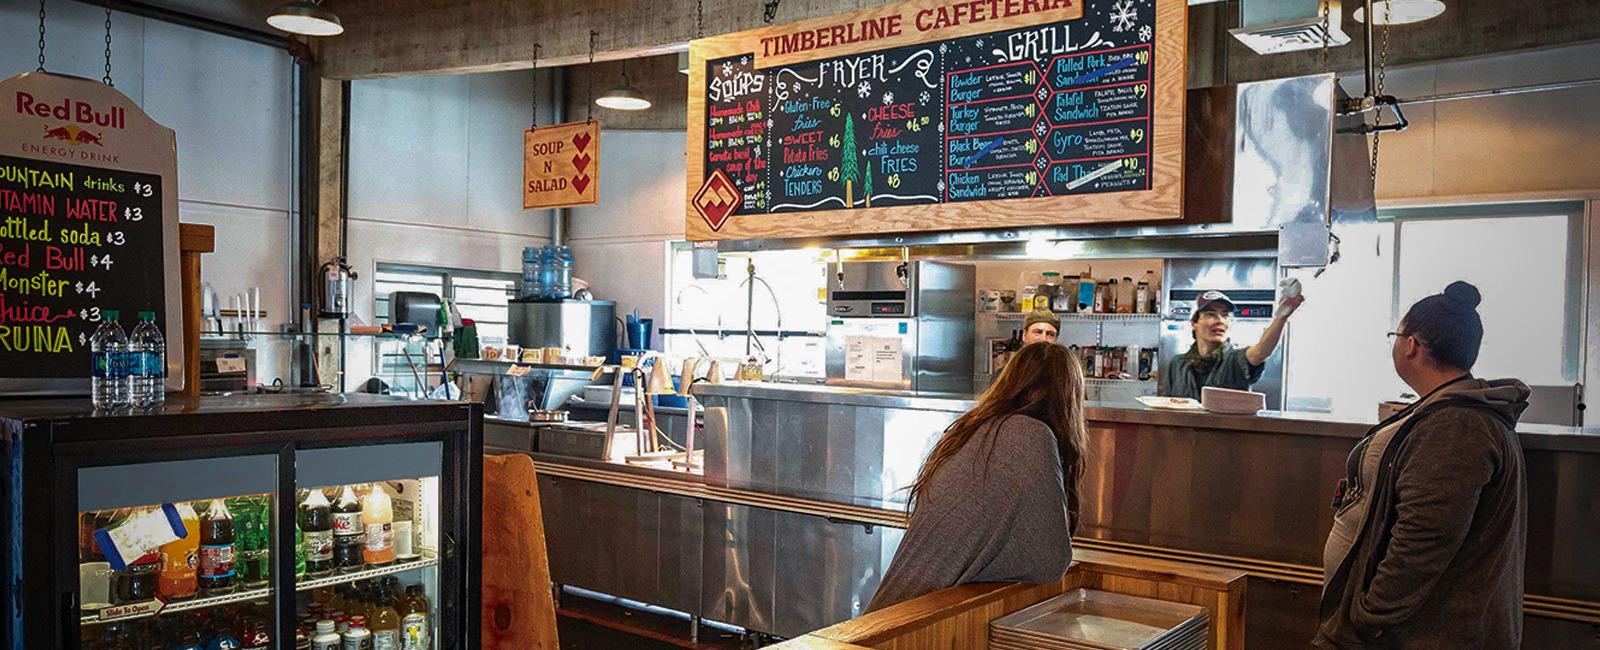 Powder Mountain Timberline Cafeteria